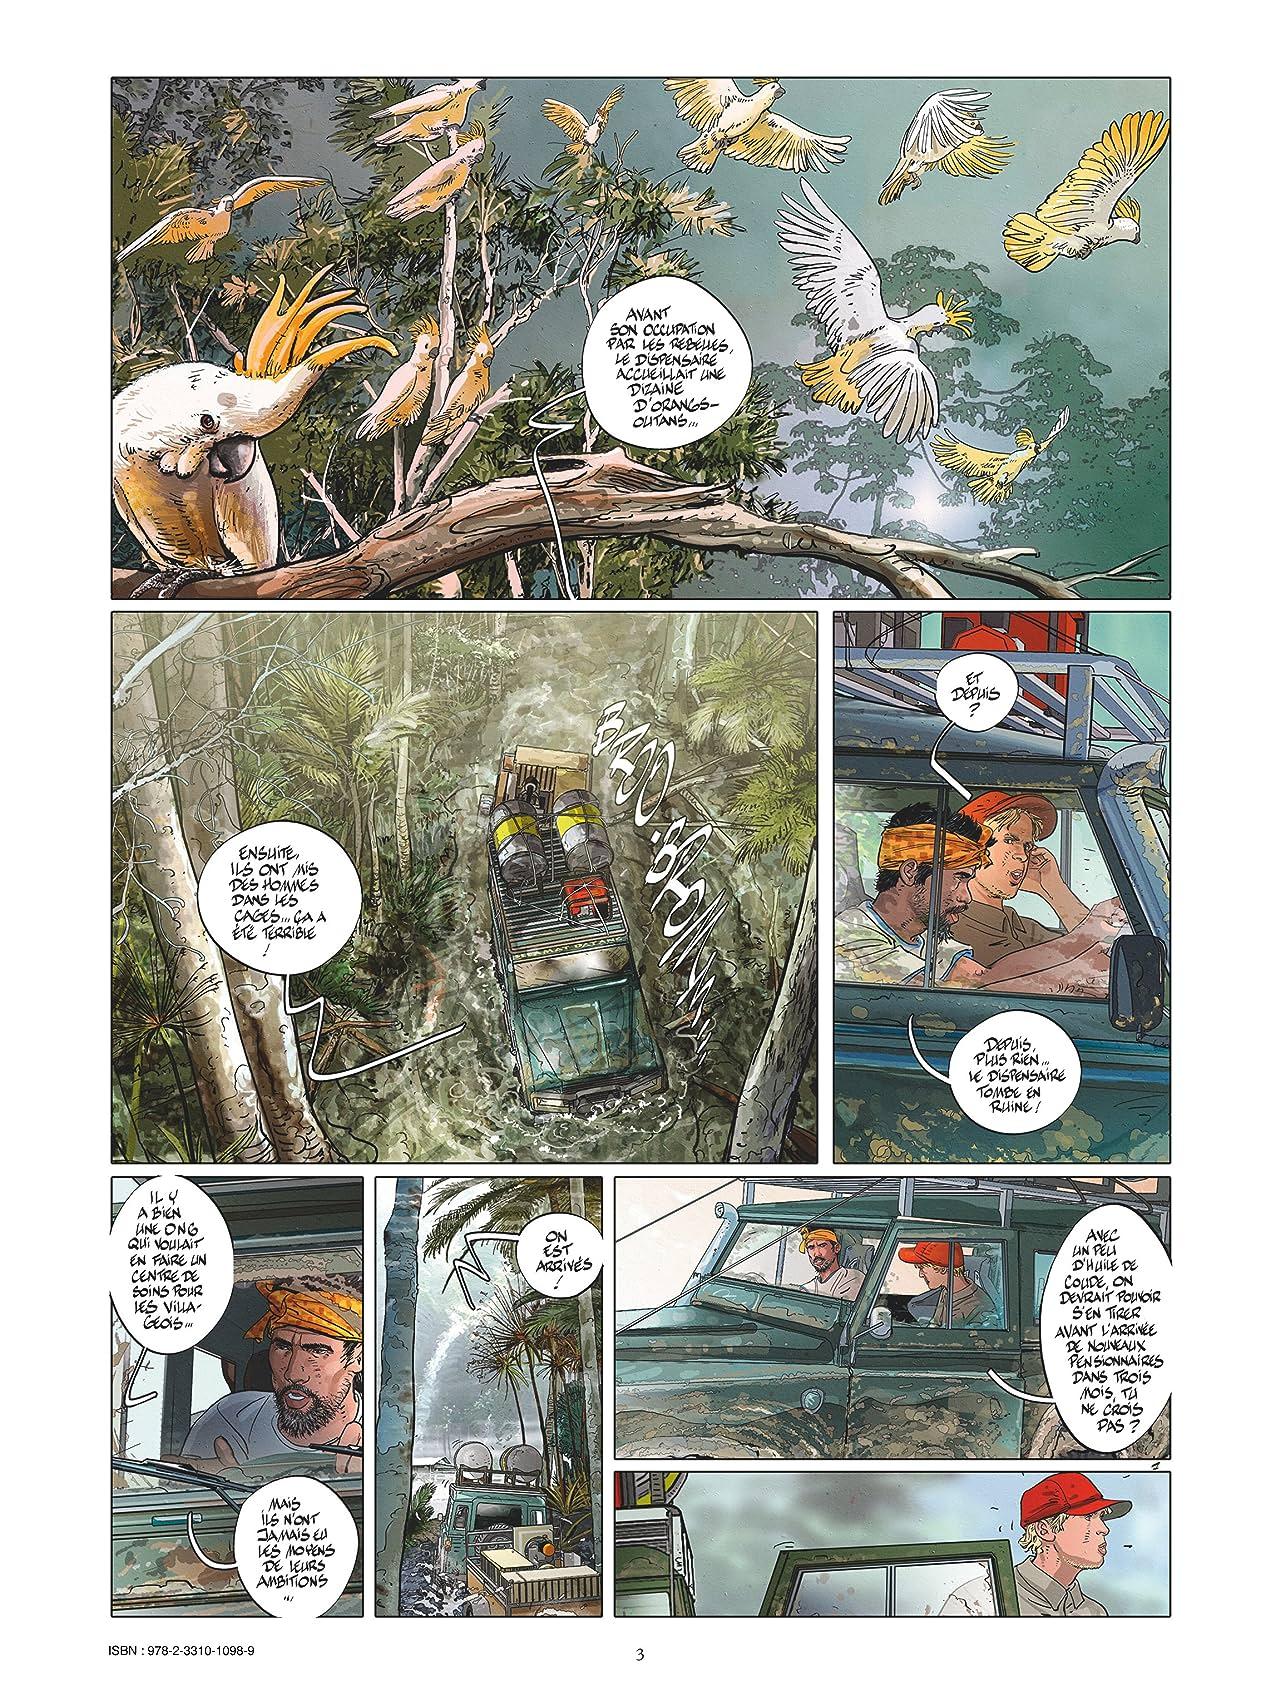 Ecowarriors Vol. 1: Orang-utan - 1